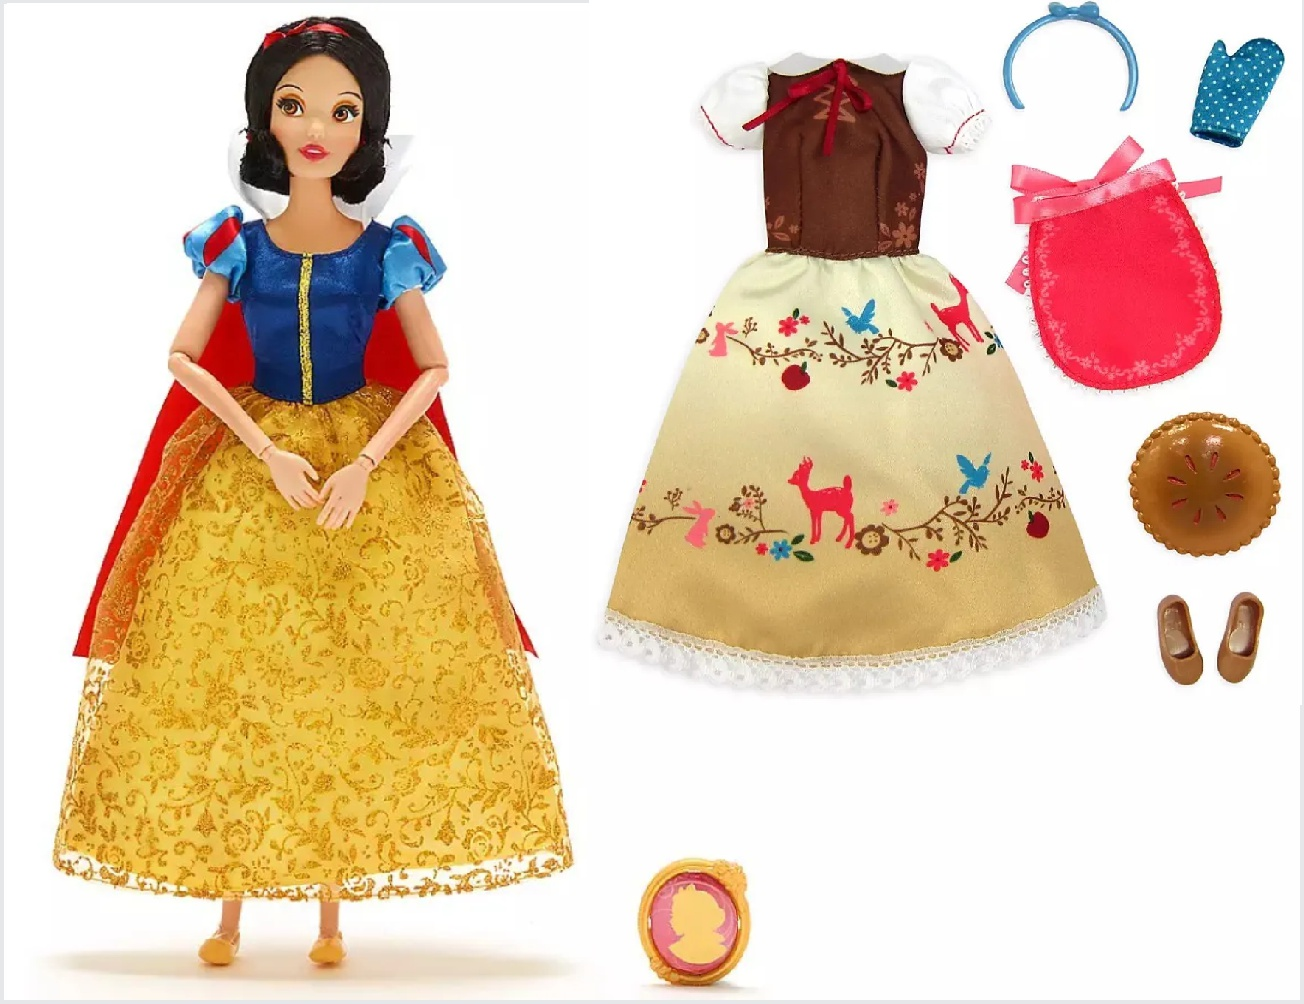 Conjunto de Boneca e Roupas da Princesa Branca de Neve